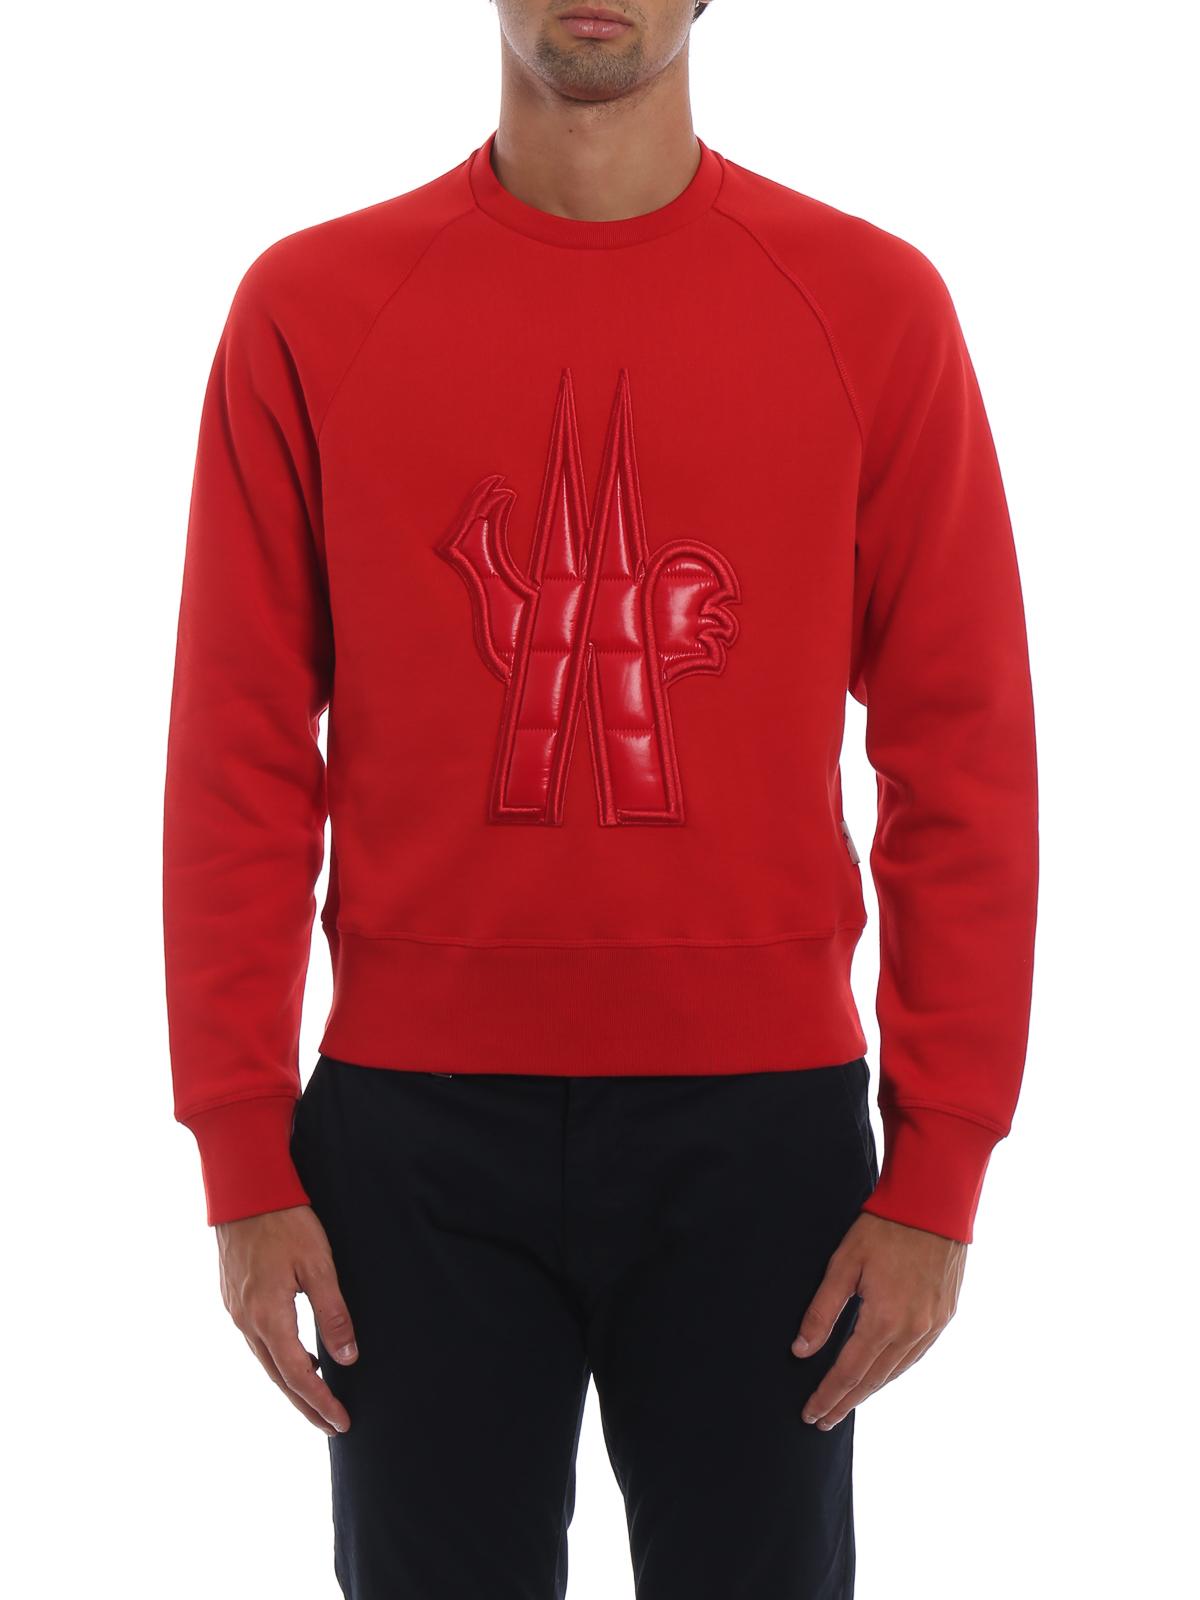 d4fce61ac Moncler Grenoble - Après-Ski bright red sweatshirt - Sweatshirts ...